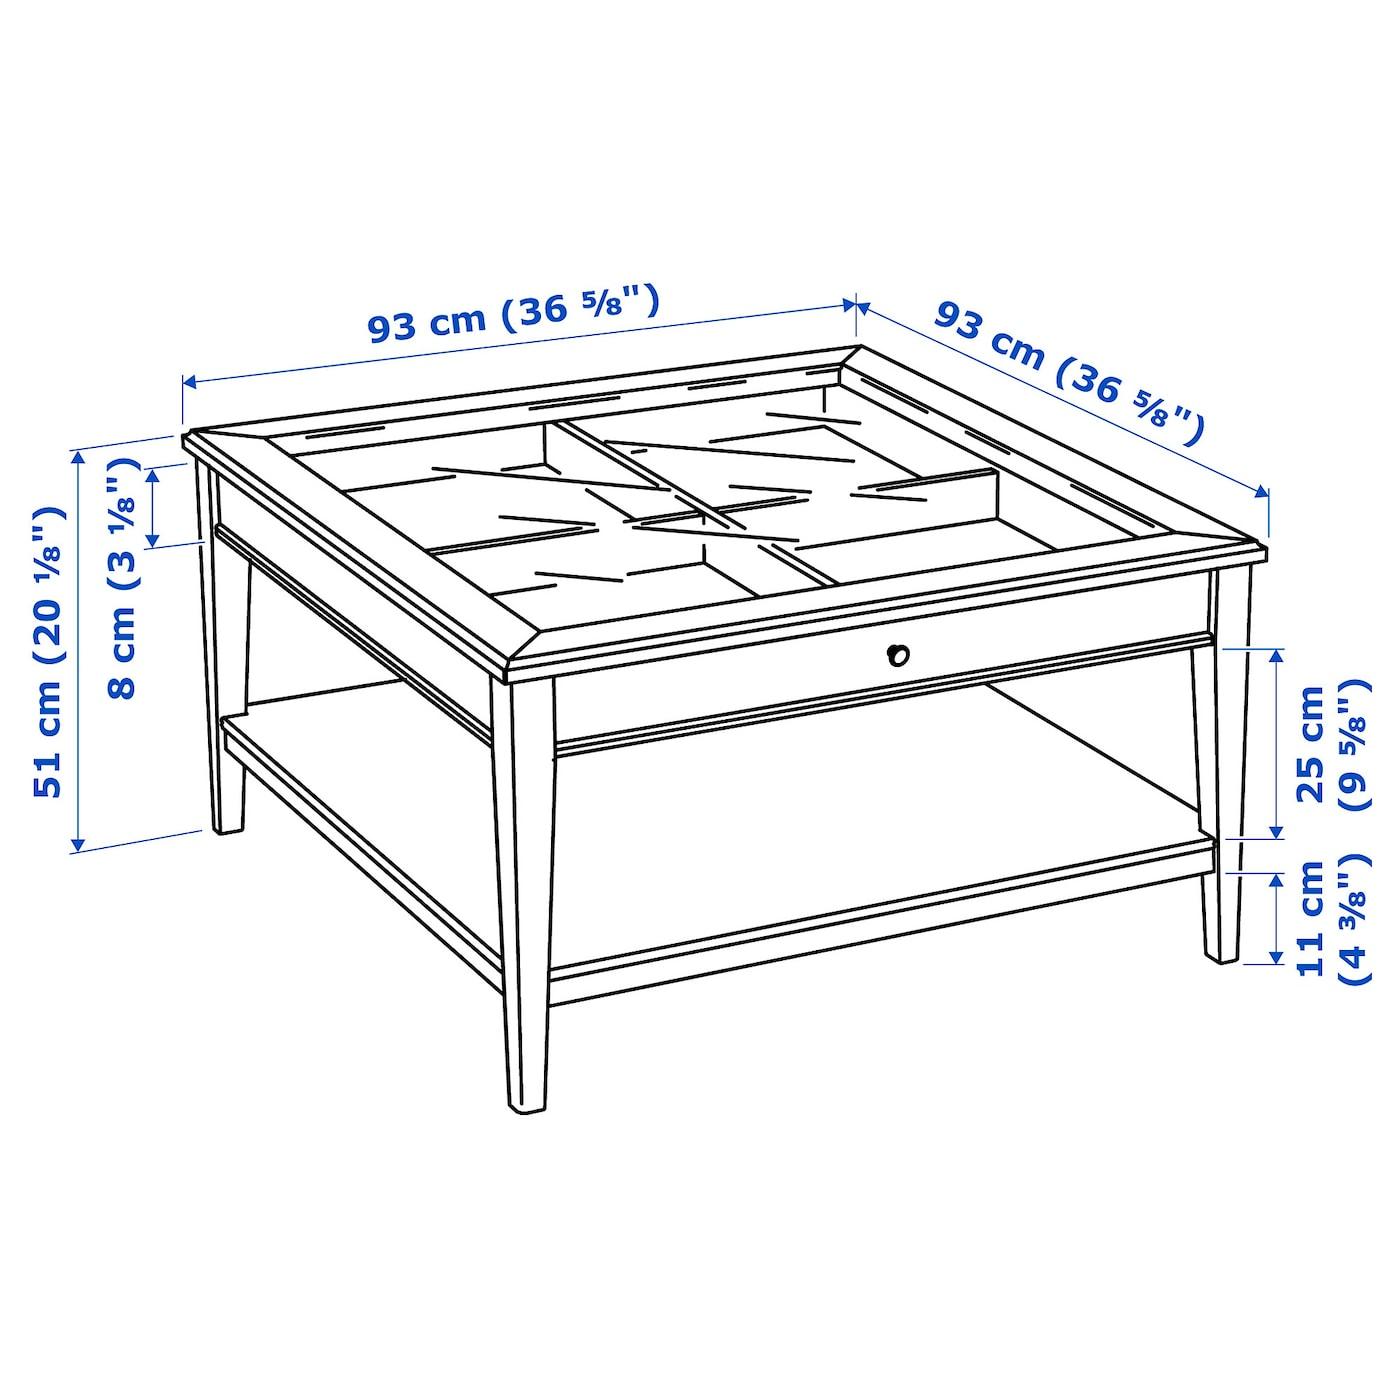 ikea coffee table dimensions